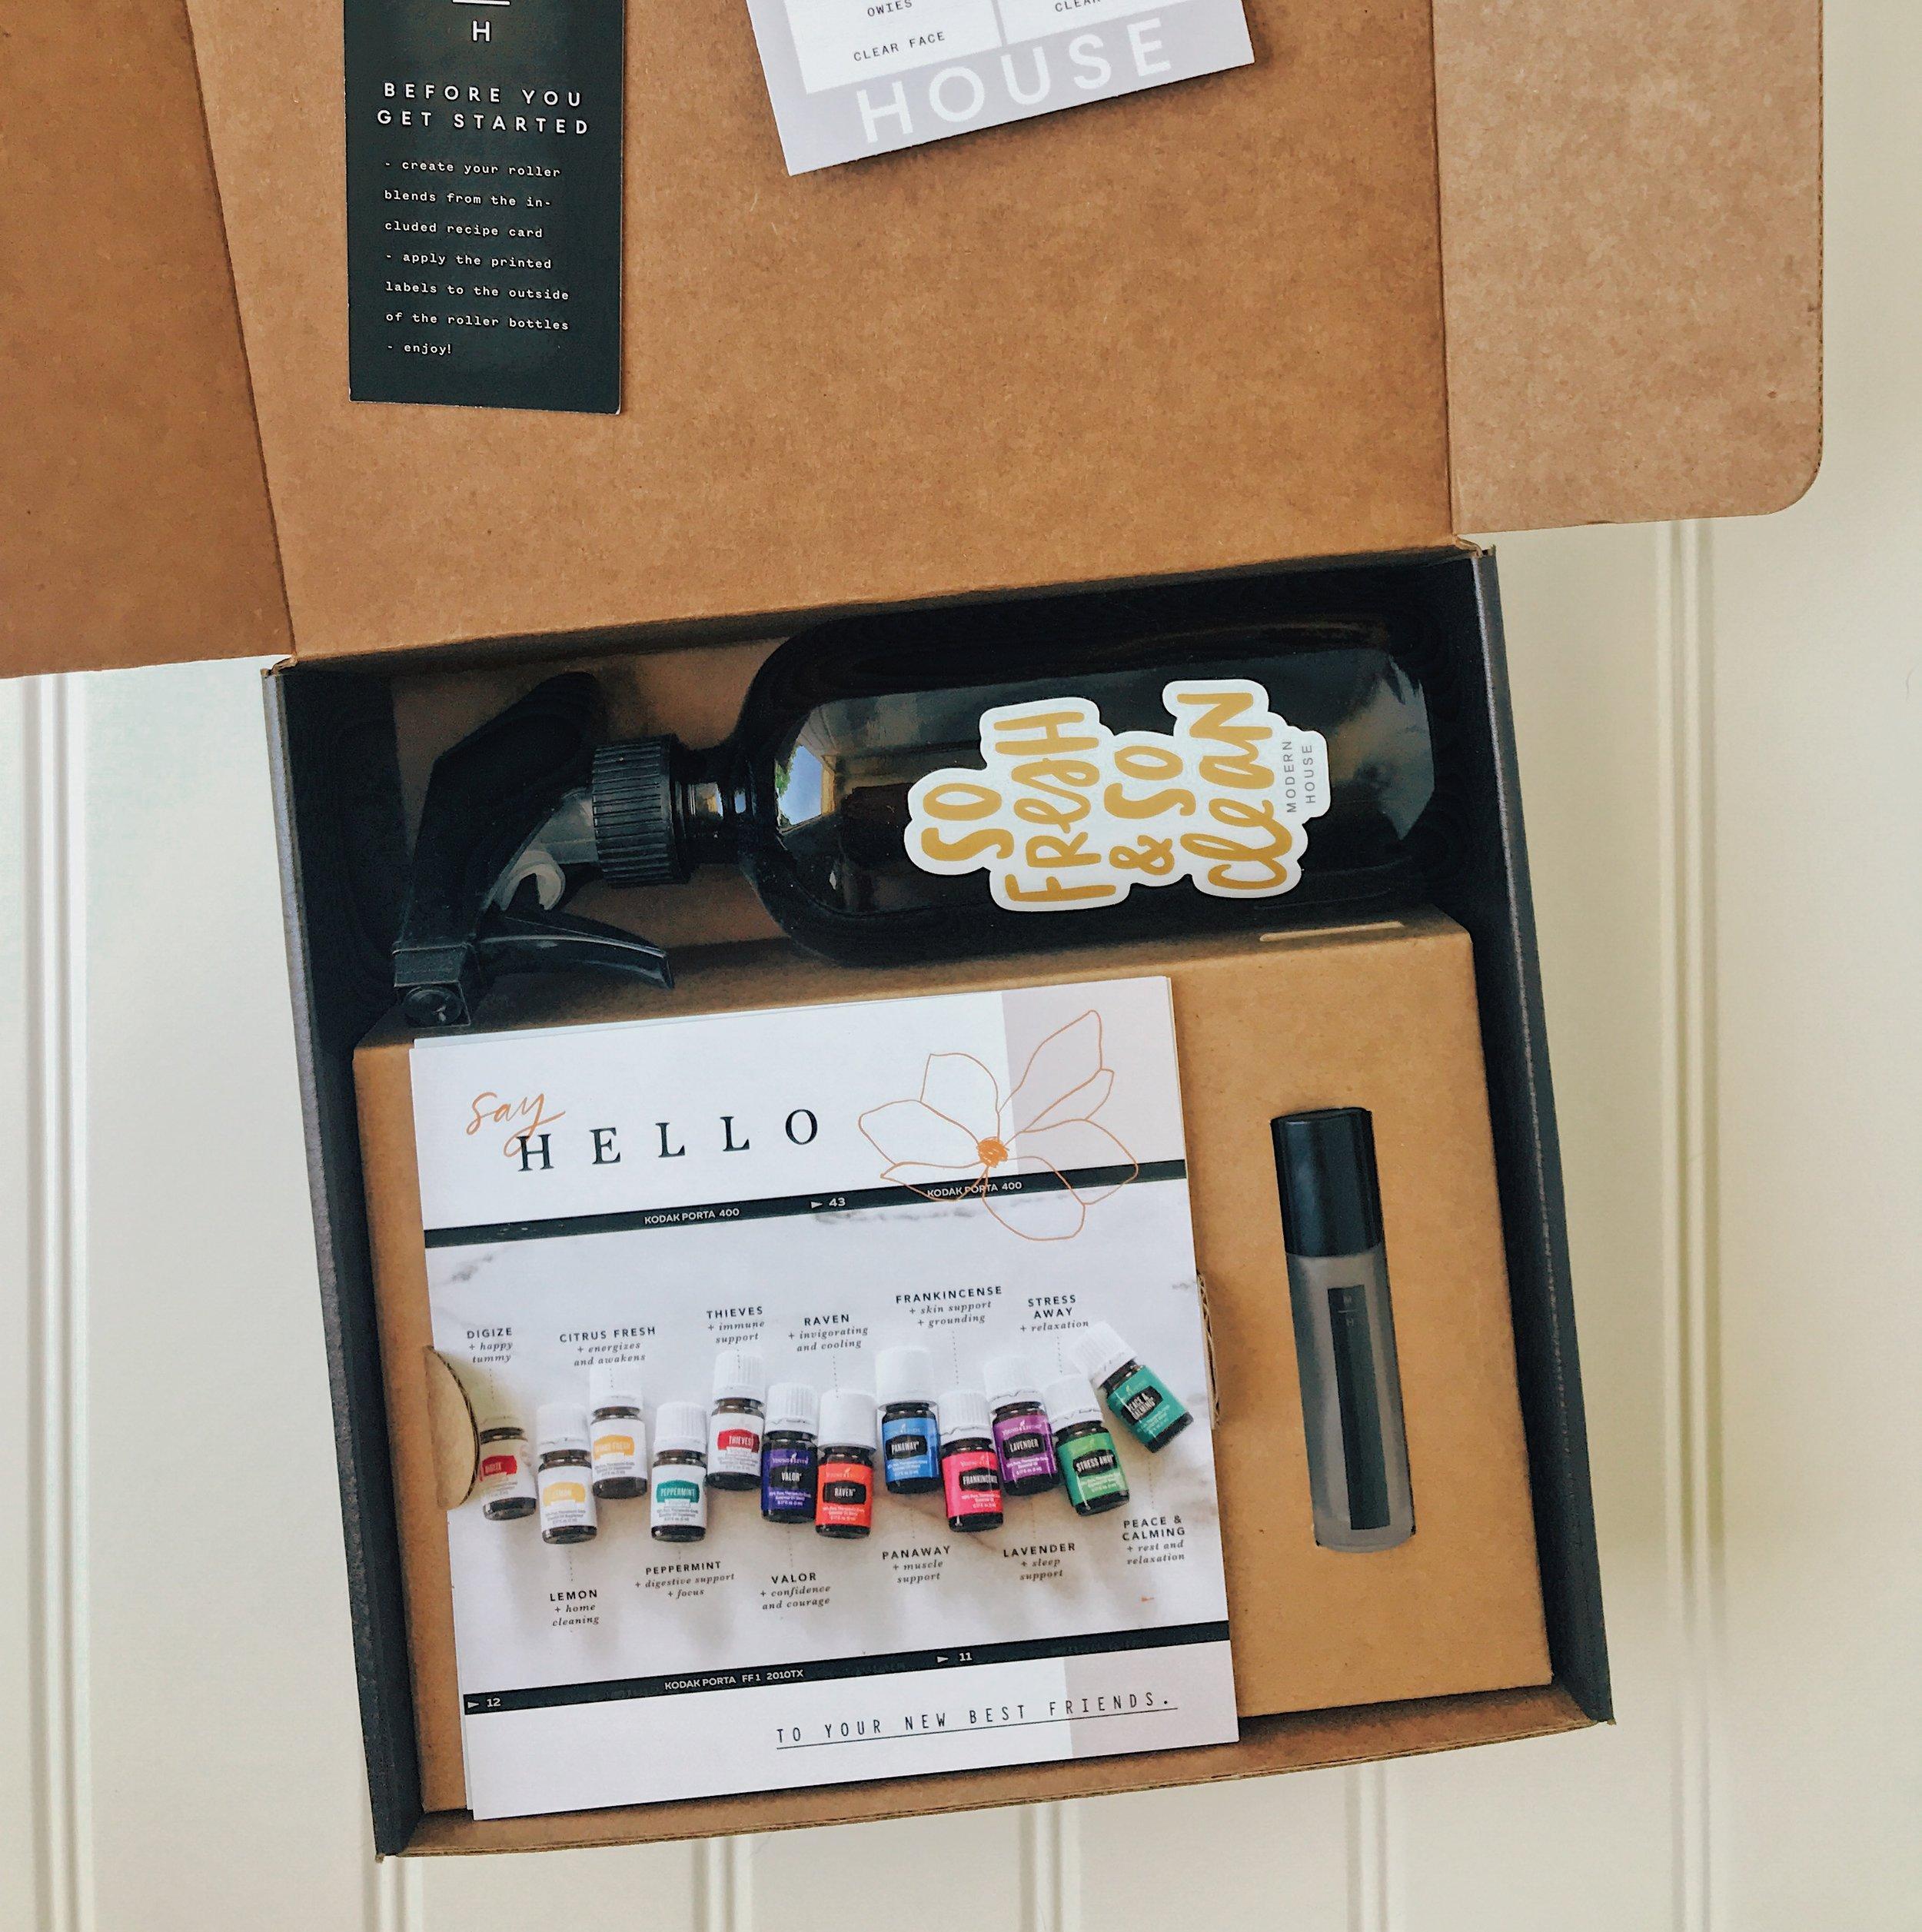 Modern HOUSE MEMBER BOXES - - 16oz Amber Glass Bottle + Fresh & Clean Sticker- 15ml Modern House Frosted Glass Roller Bottle- 20 Roller Labels- Diffuser Blends Card- Roller Recipes Card- Premium Starter Kit Card- Thieves Household Cleaner Recipe Card